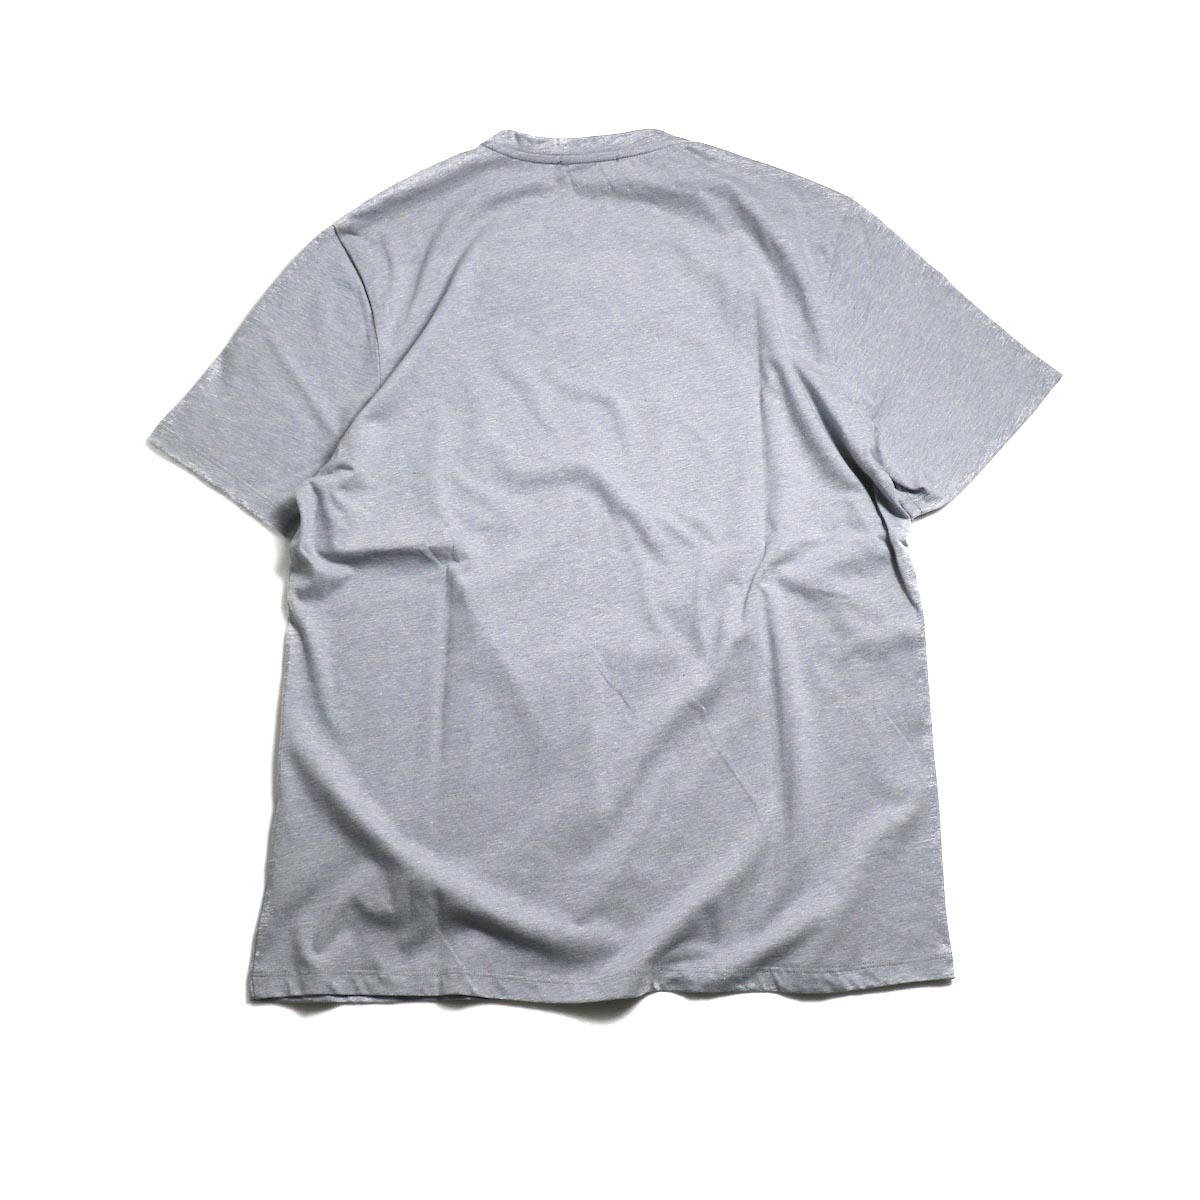 A.P.C. / Logo Tシャツ 背面